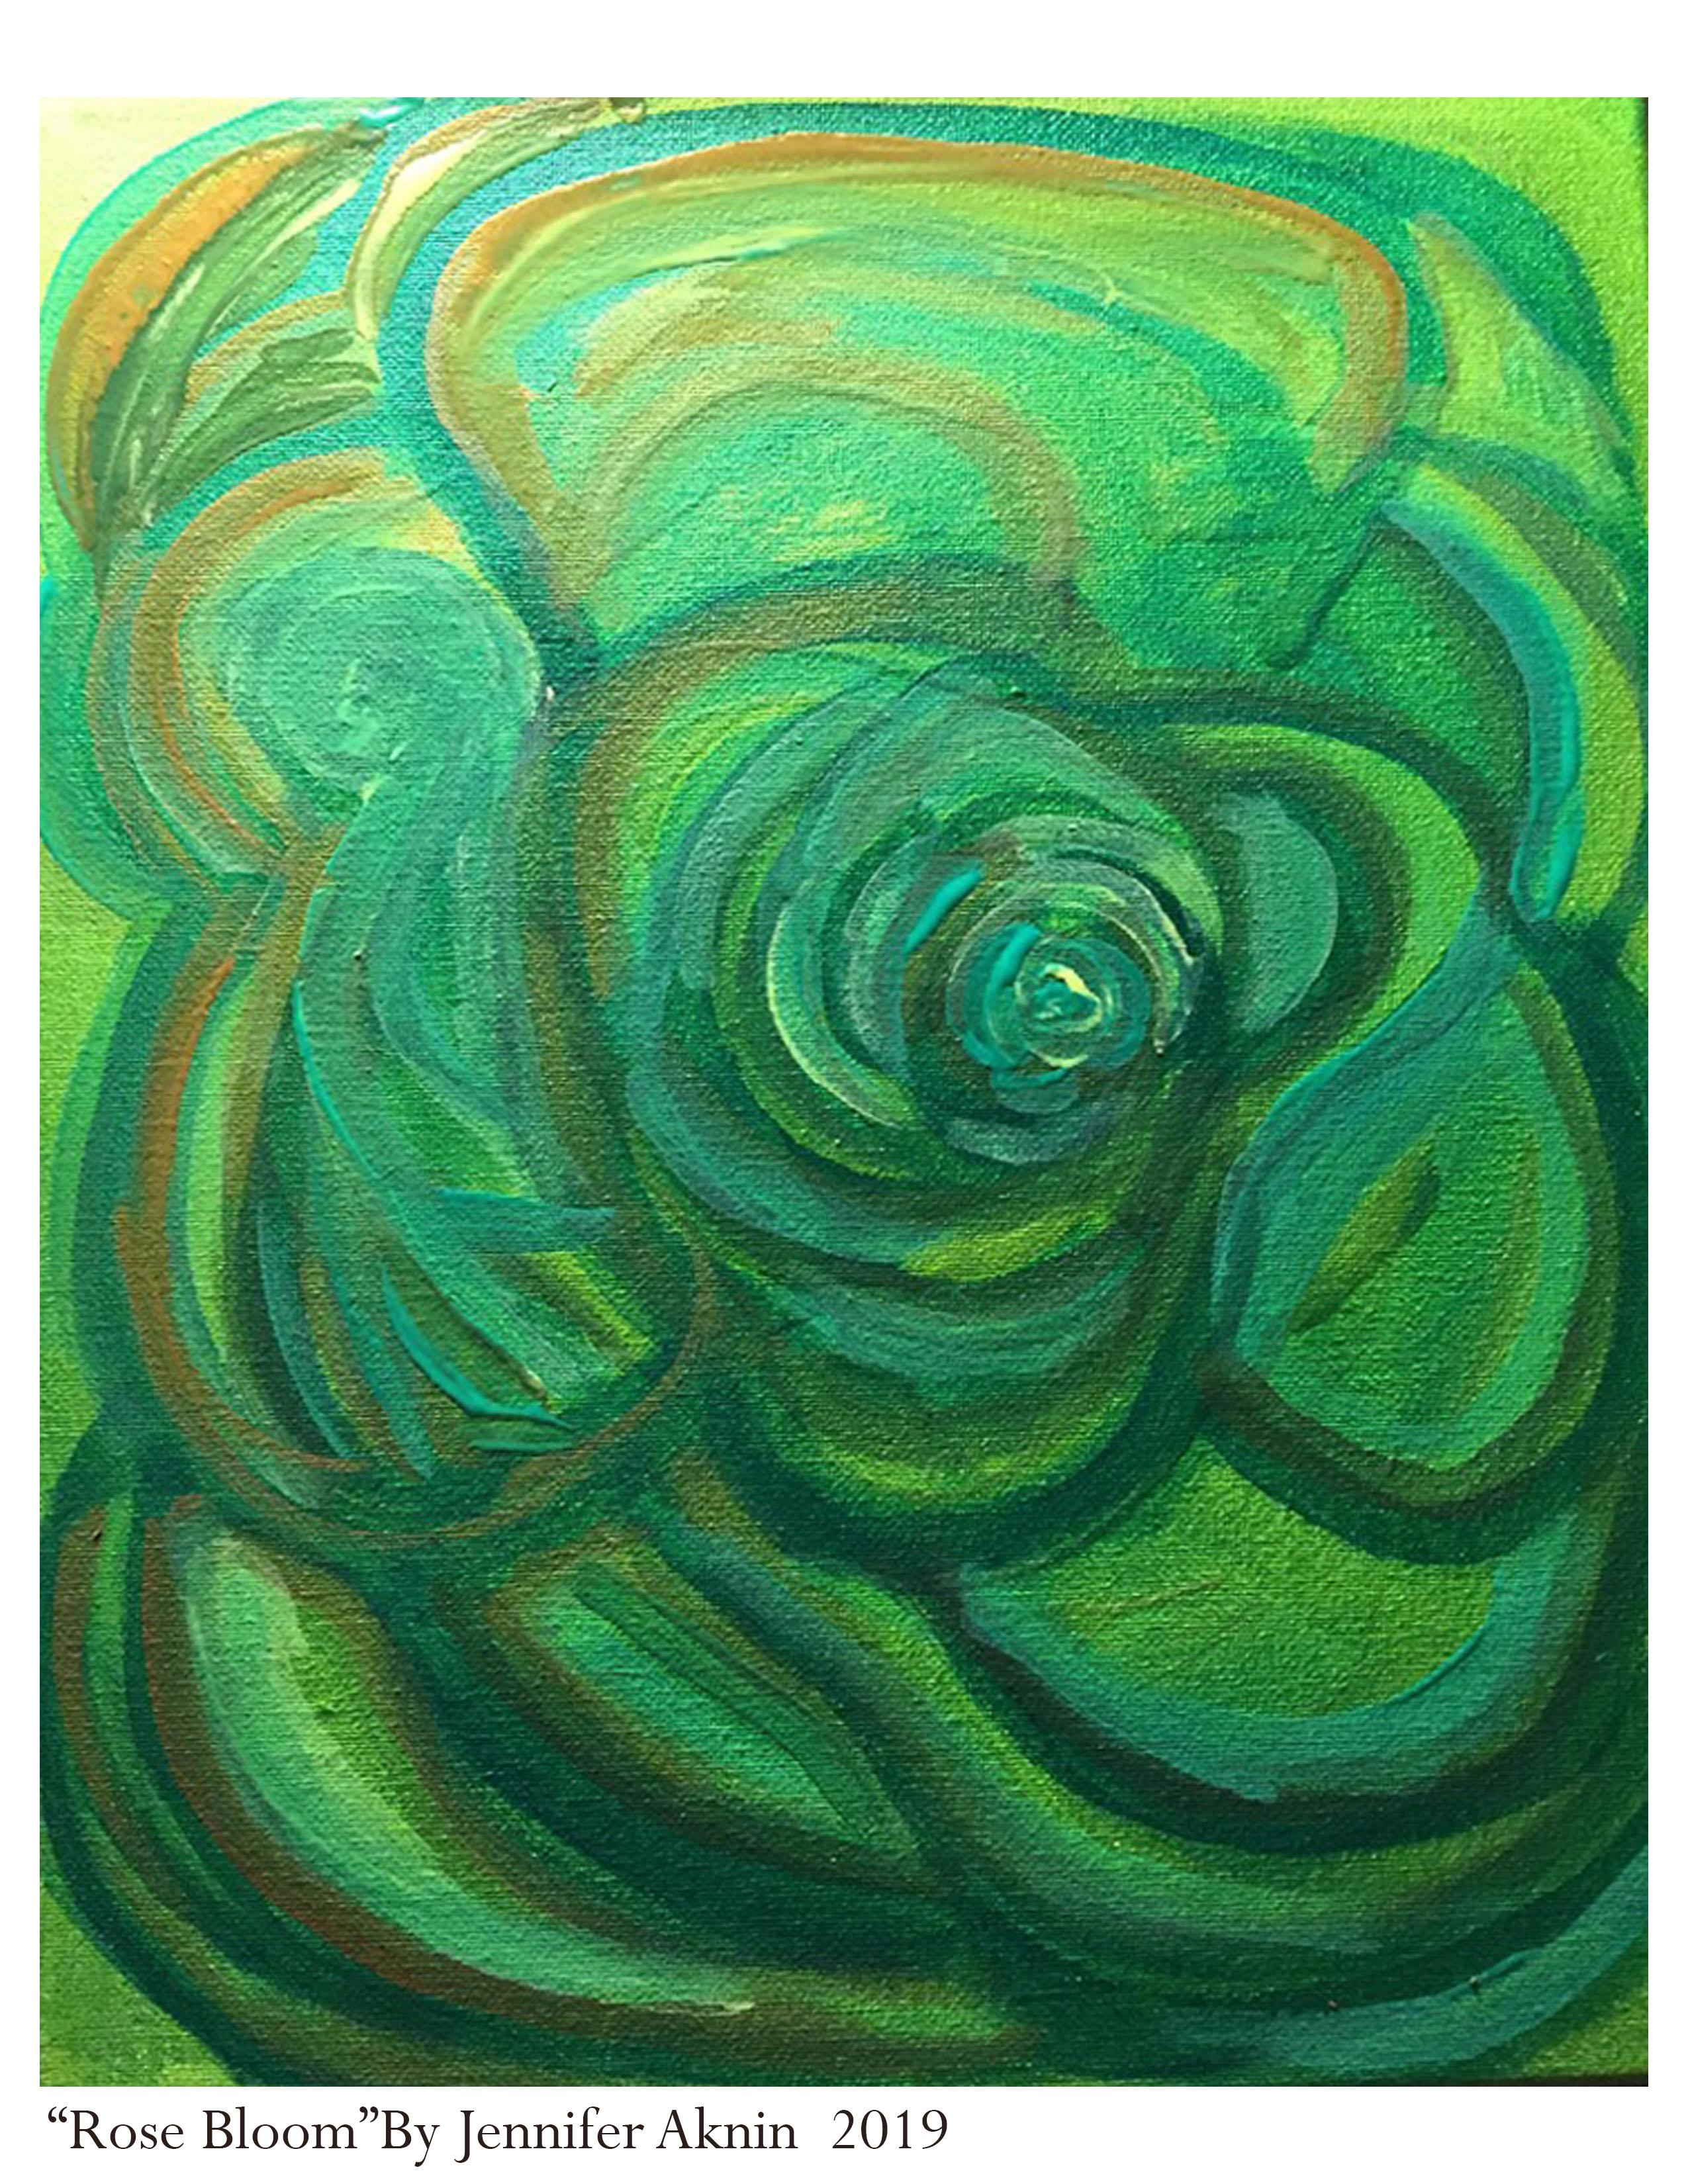 Rose Bloom Print 2019